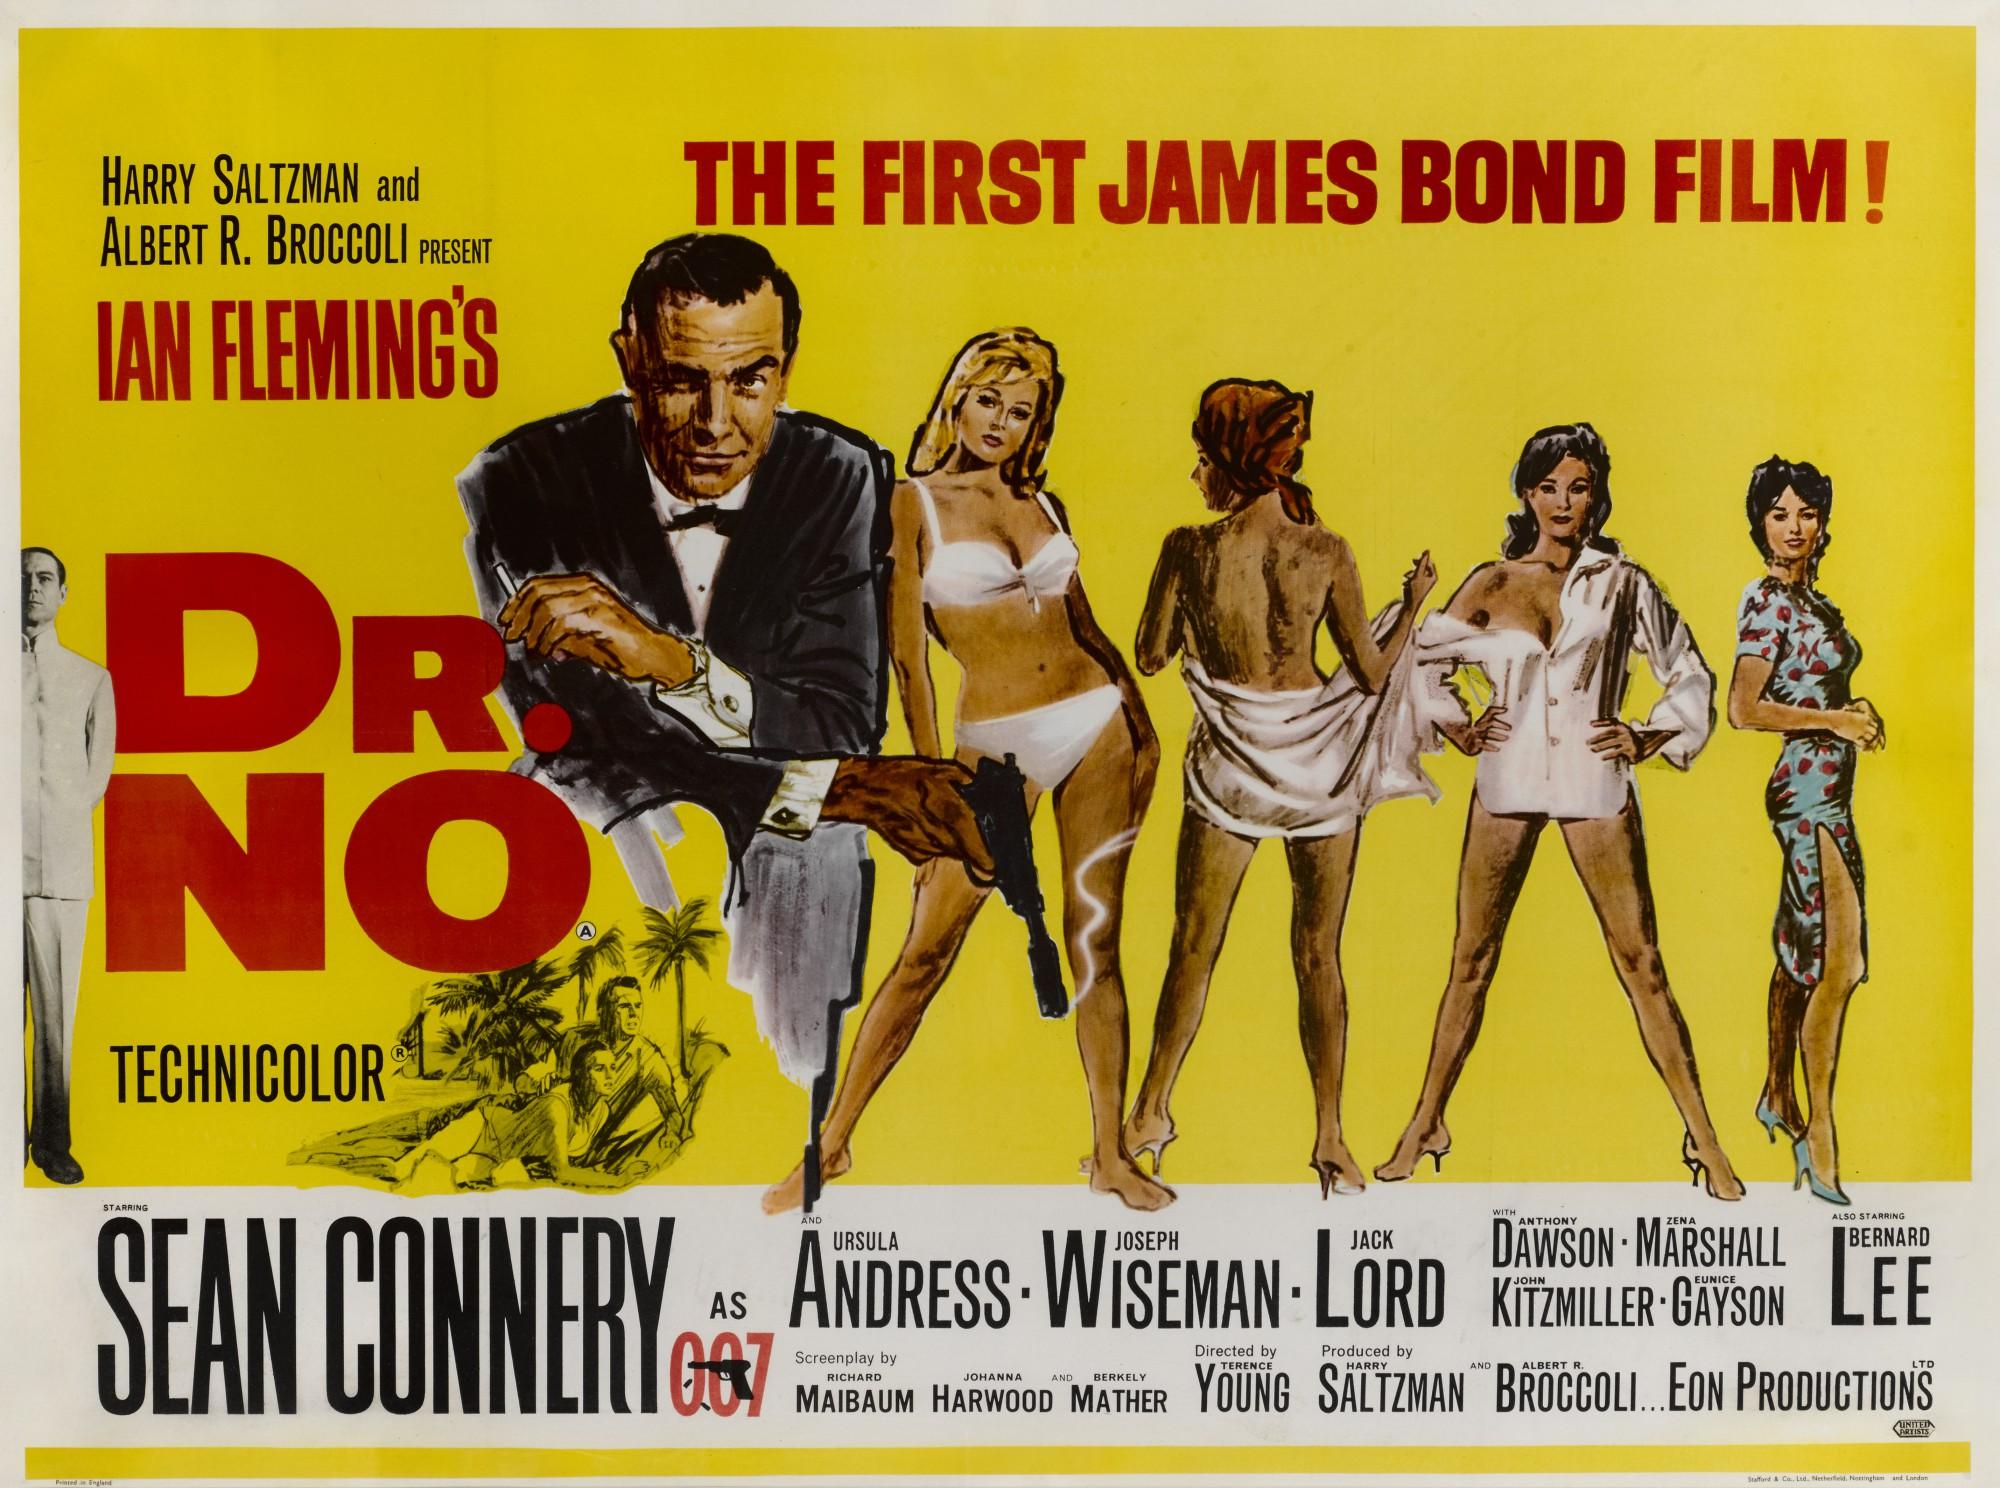 DR. NO (1962) POSTER, BRITISH